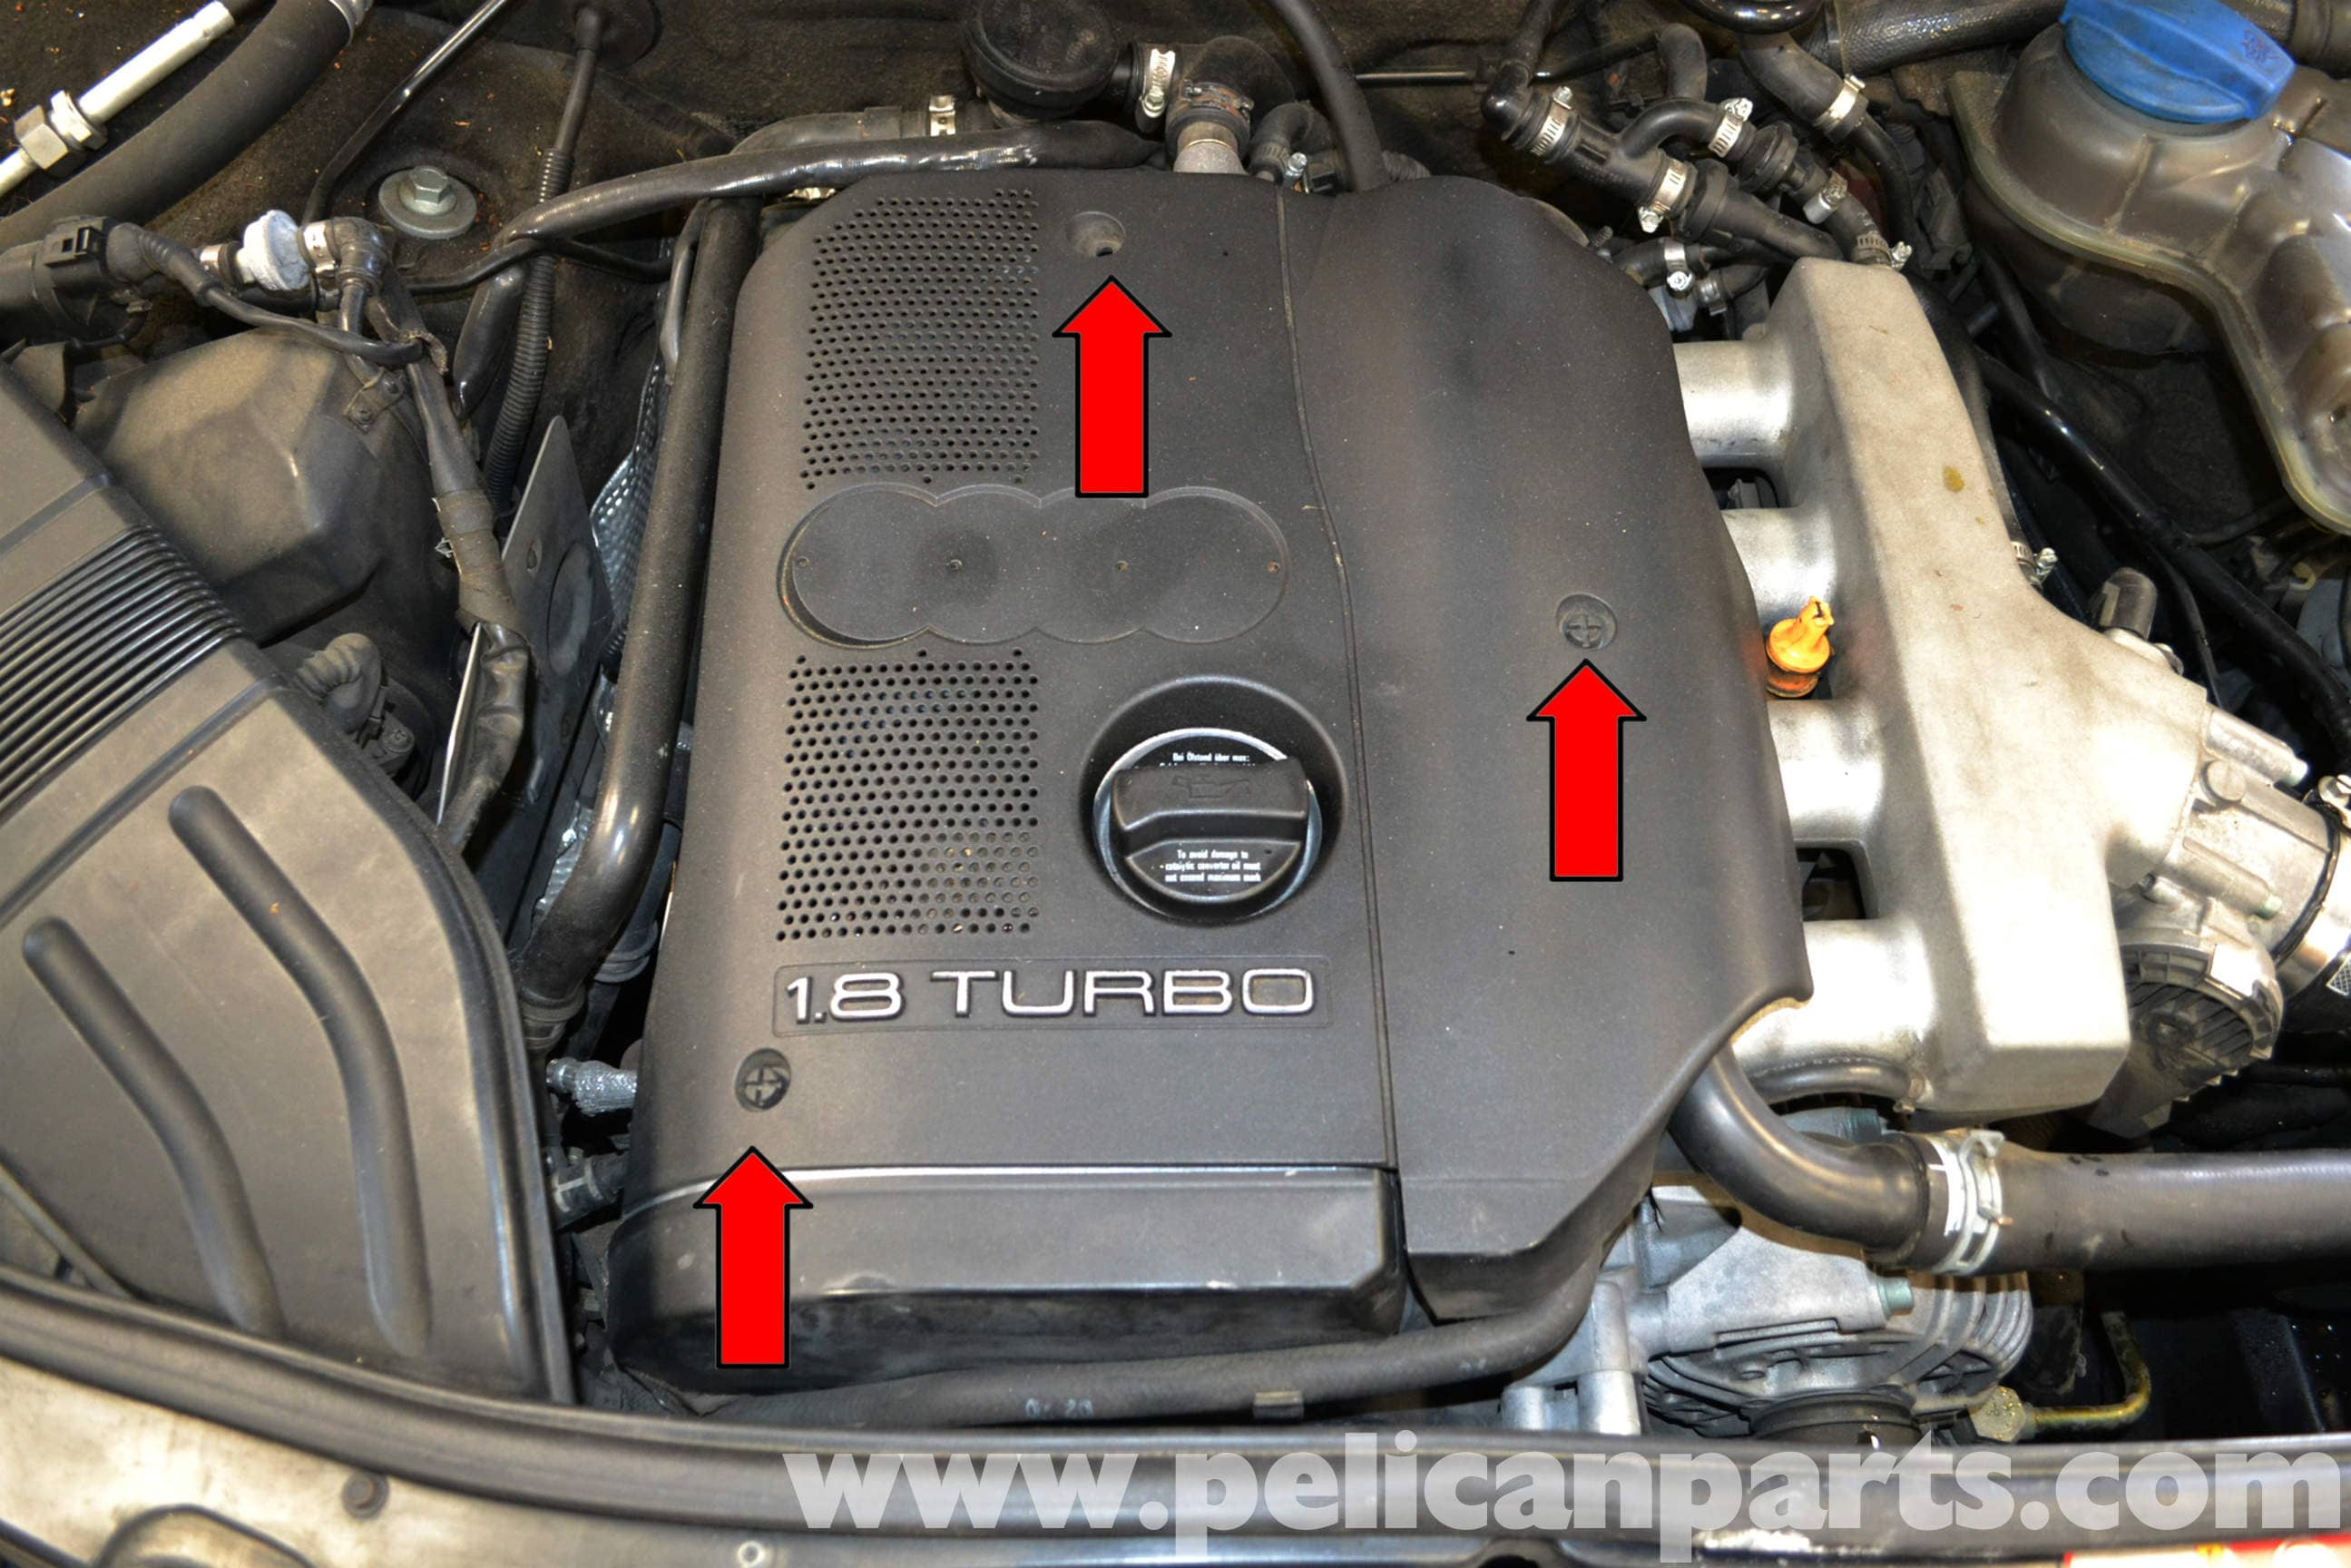 audi a4 b6 spark plug and coil replacement 1 8t 2002 2008 rh pelicanparts com Audi A4 Spark Plug Wires For Spark Plug Wiring Diagram 98 Audi A4 Quattro